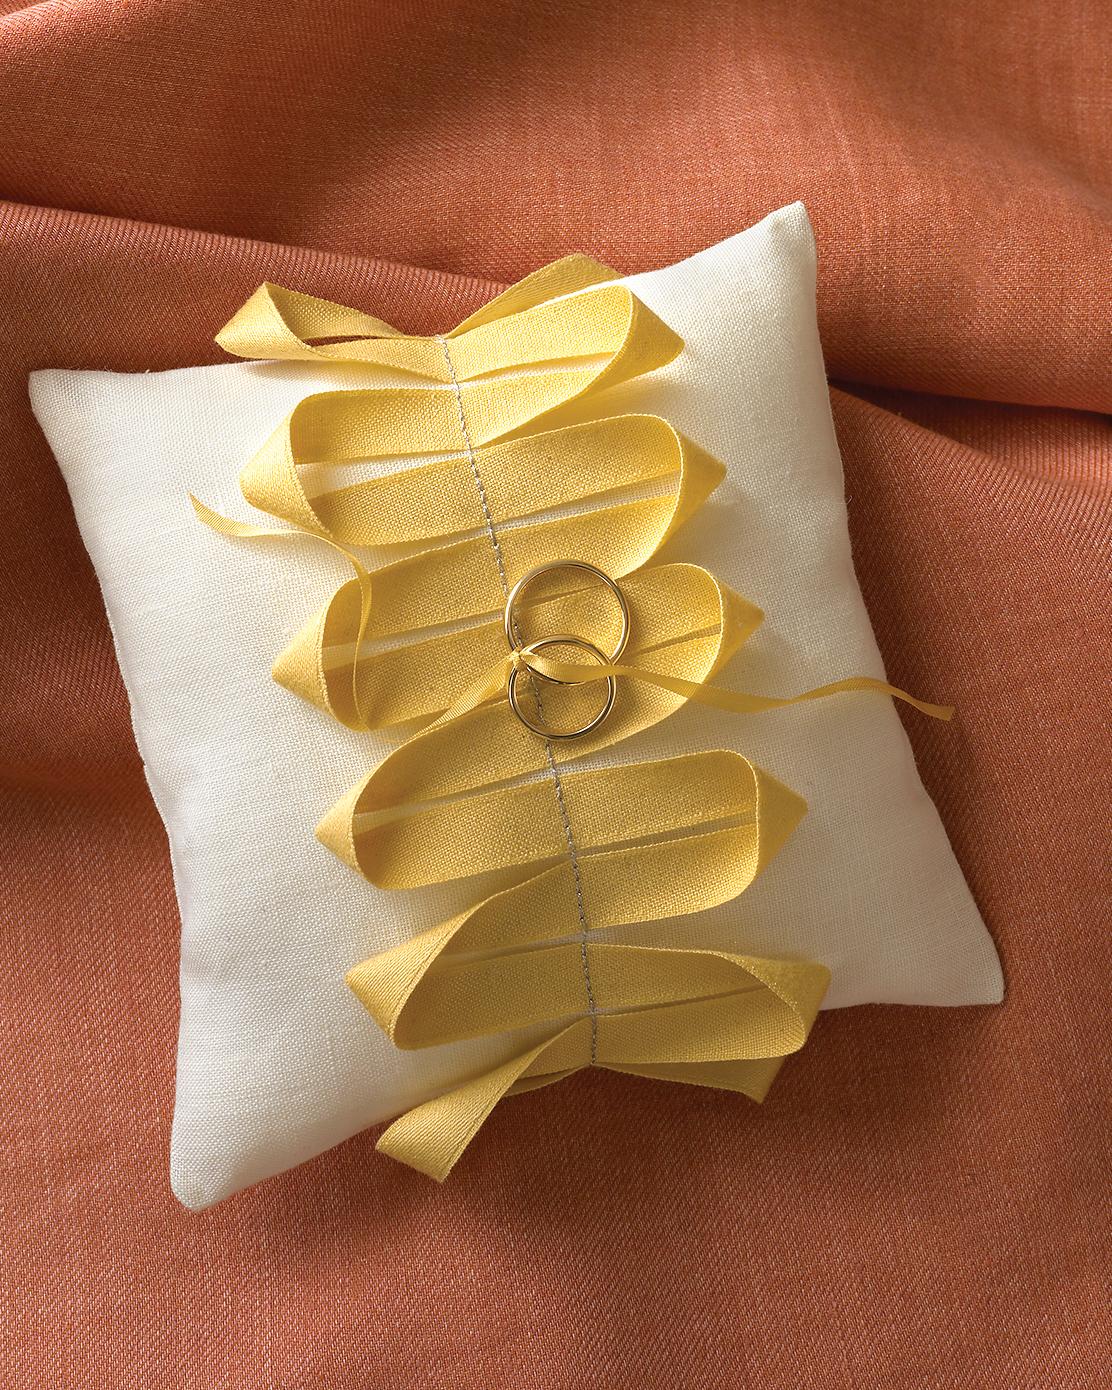 diy-ring-pillows-mwd103633-ribbon-0515.jpg